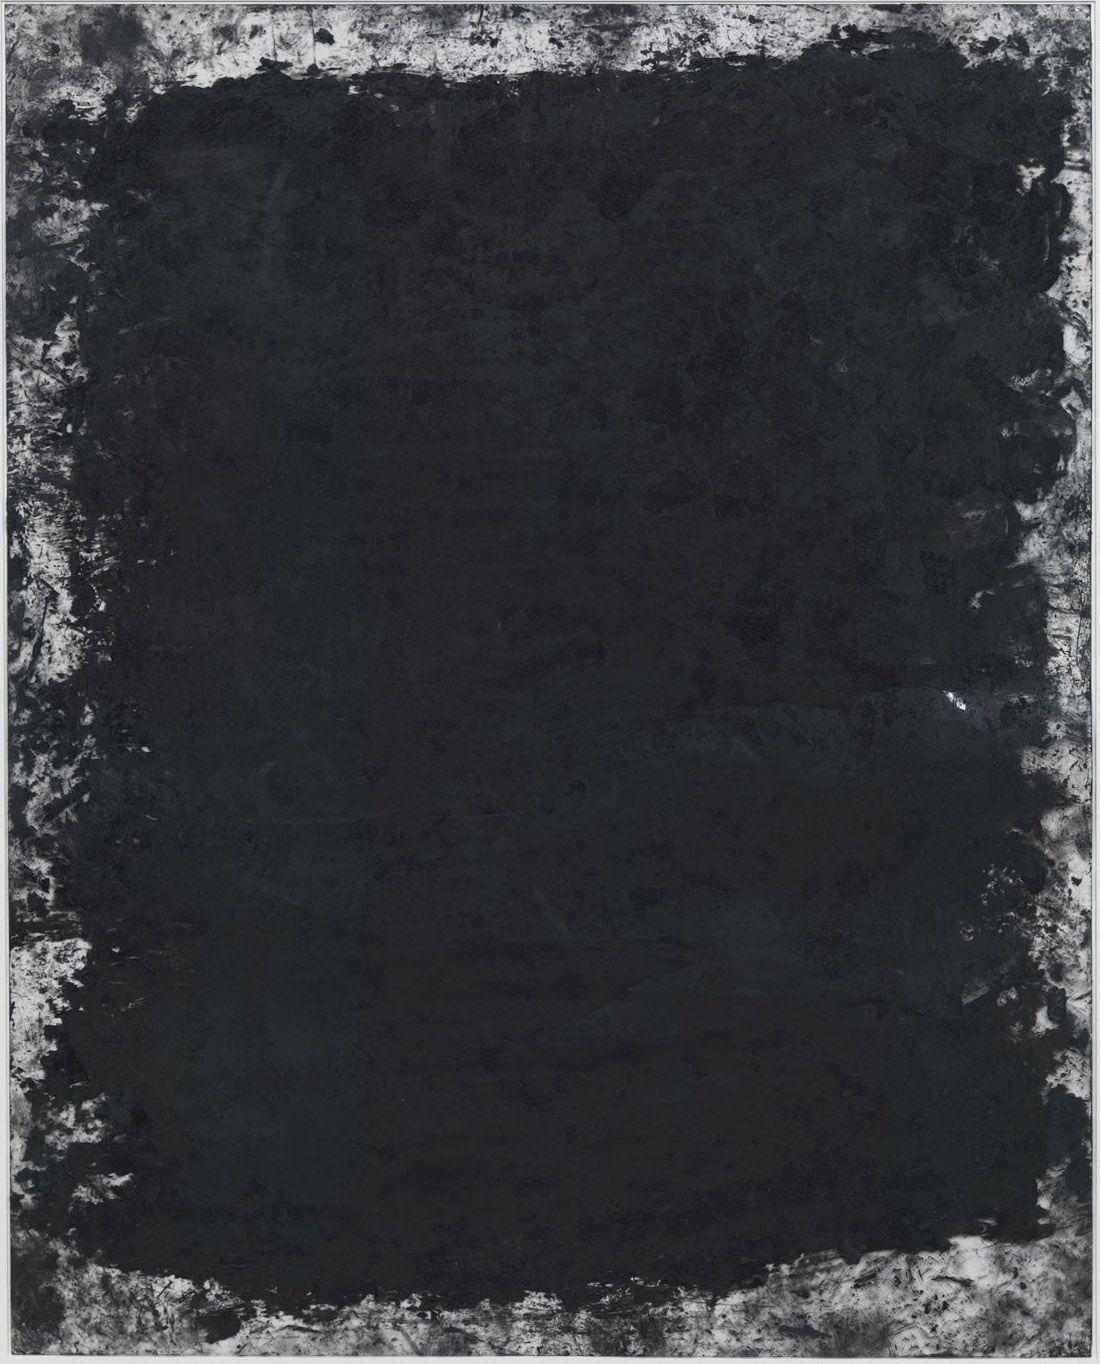 Richard Serra,Transparency #10, 2012.